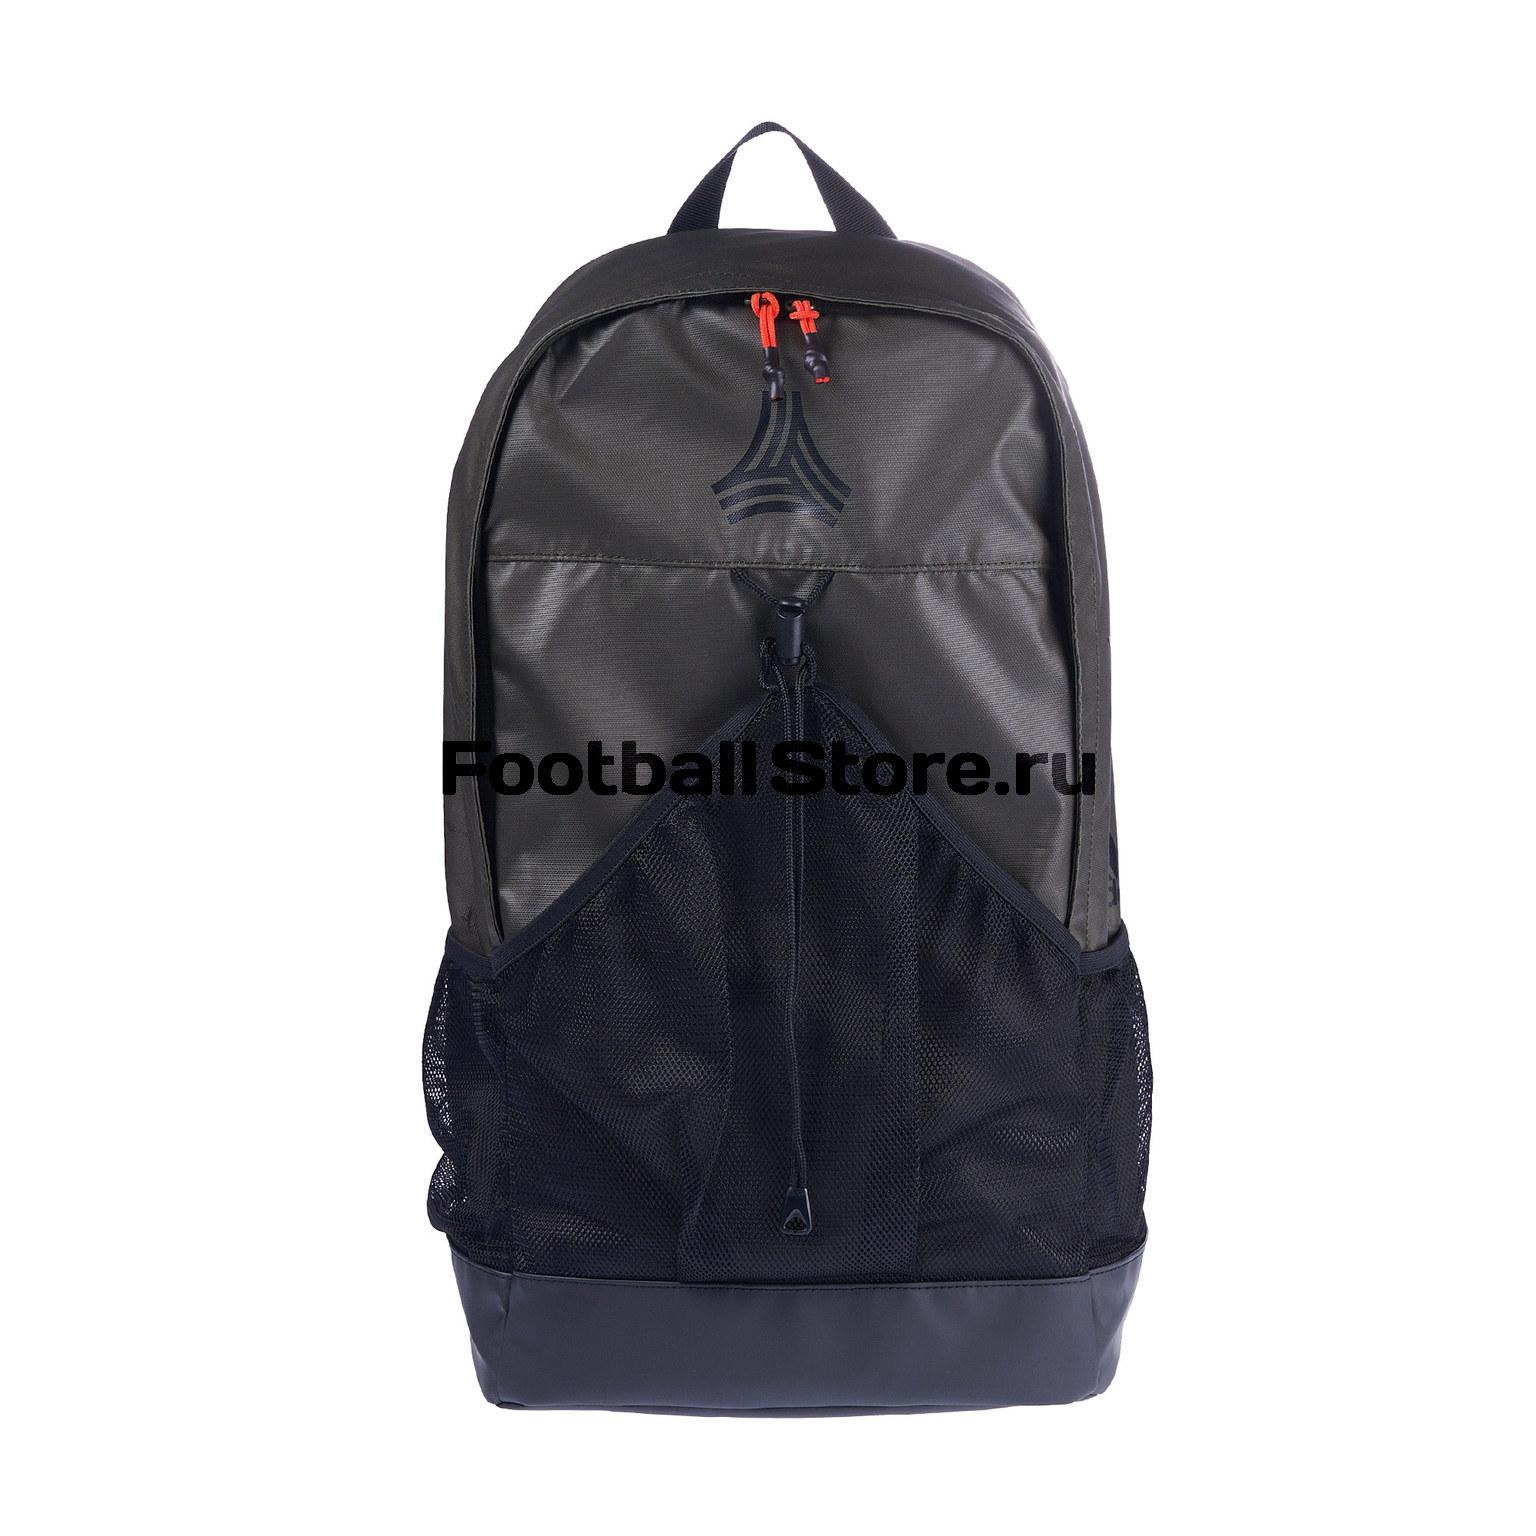 Рюкзак Adidas Football Street Better CY5629 рюкзак adidas